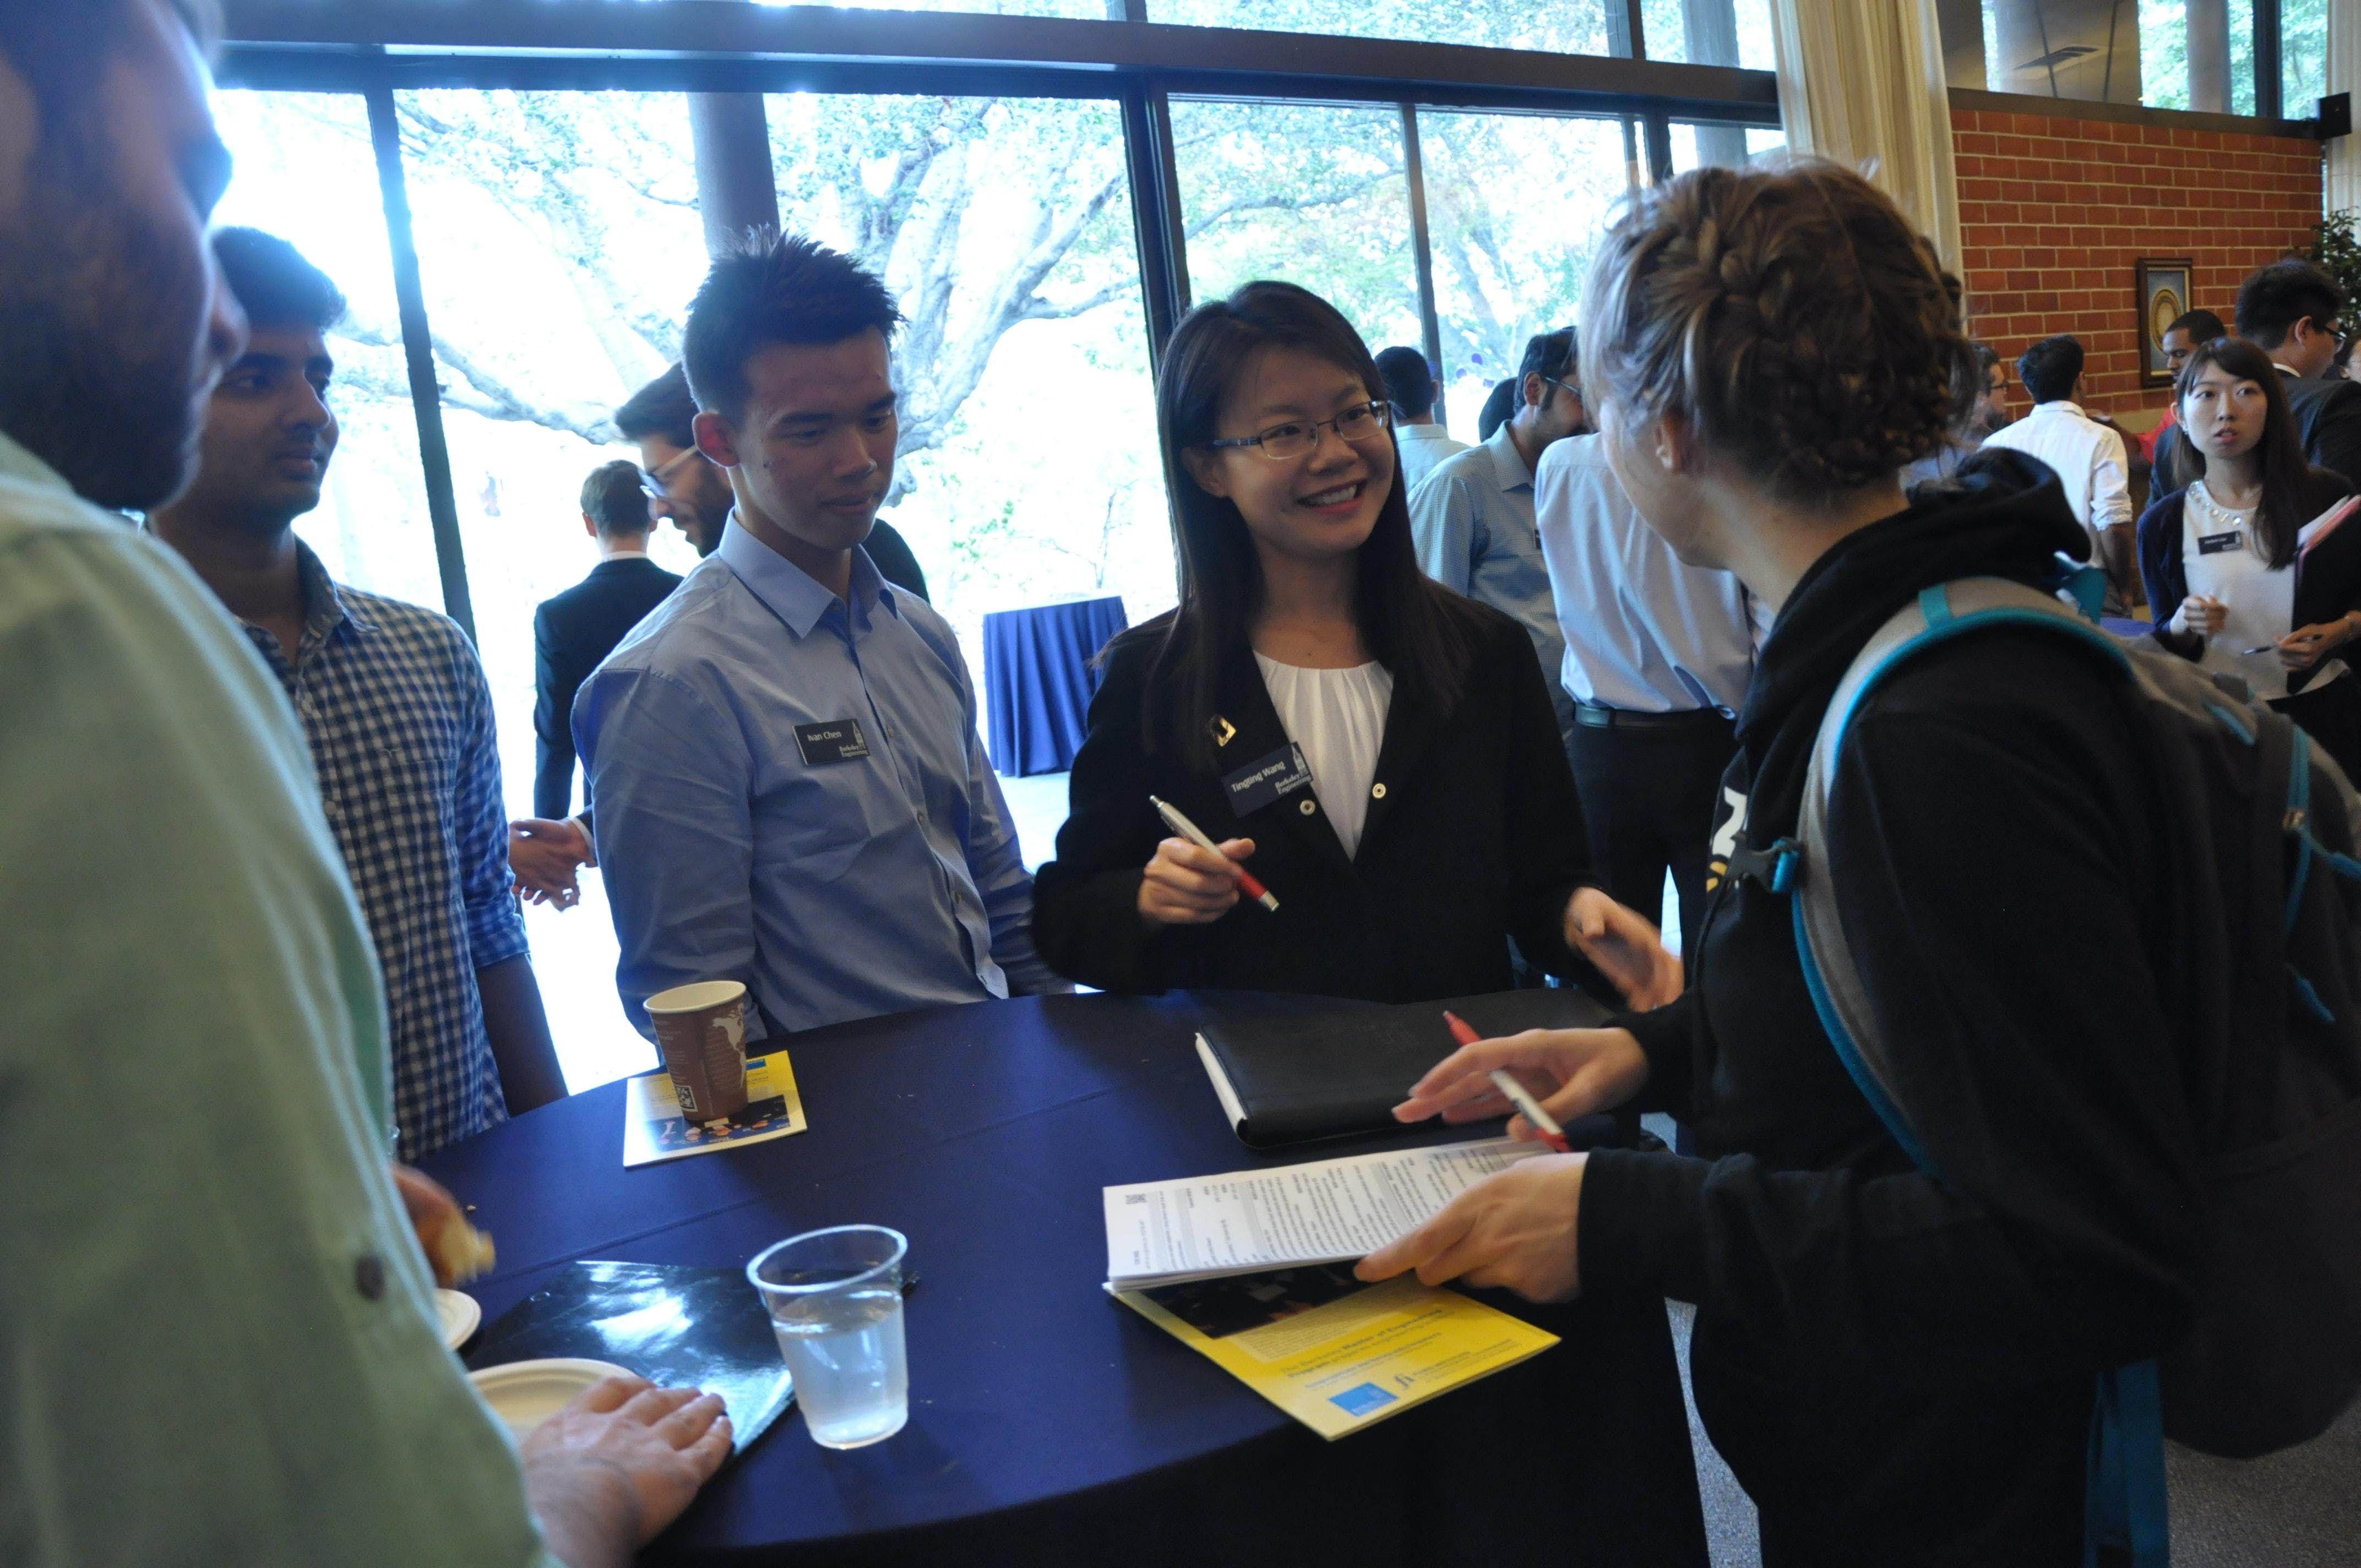 UCB Employer Breakfast - A STEM Career Fair Event